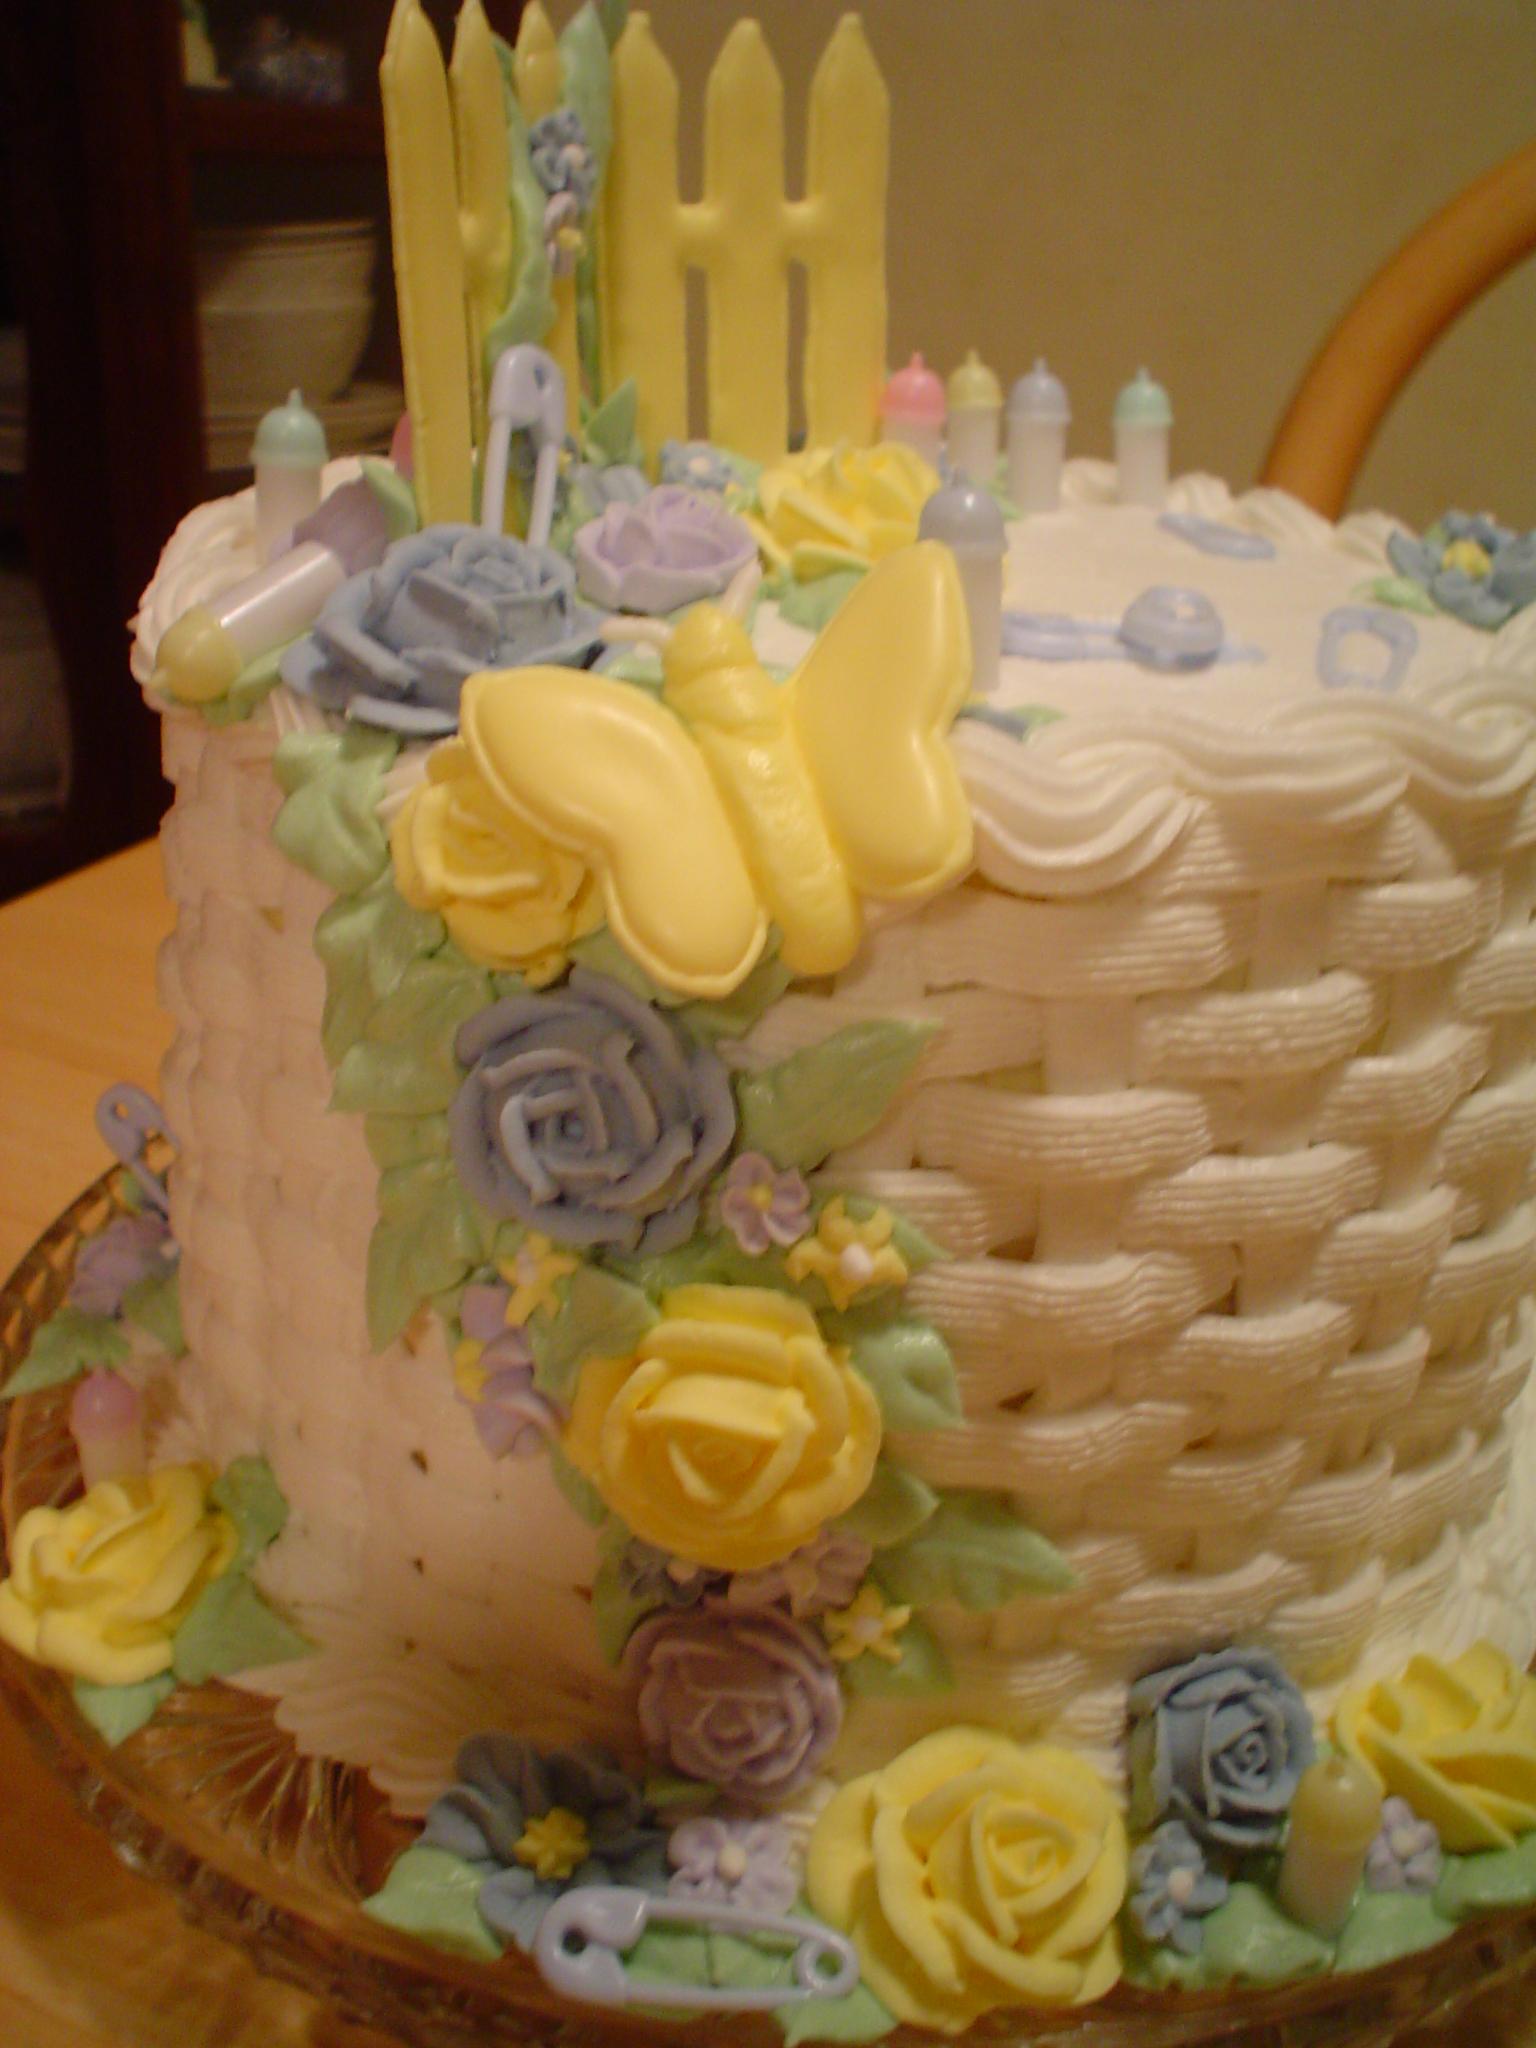 Shower_cake_004 - Copy.JPG